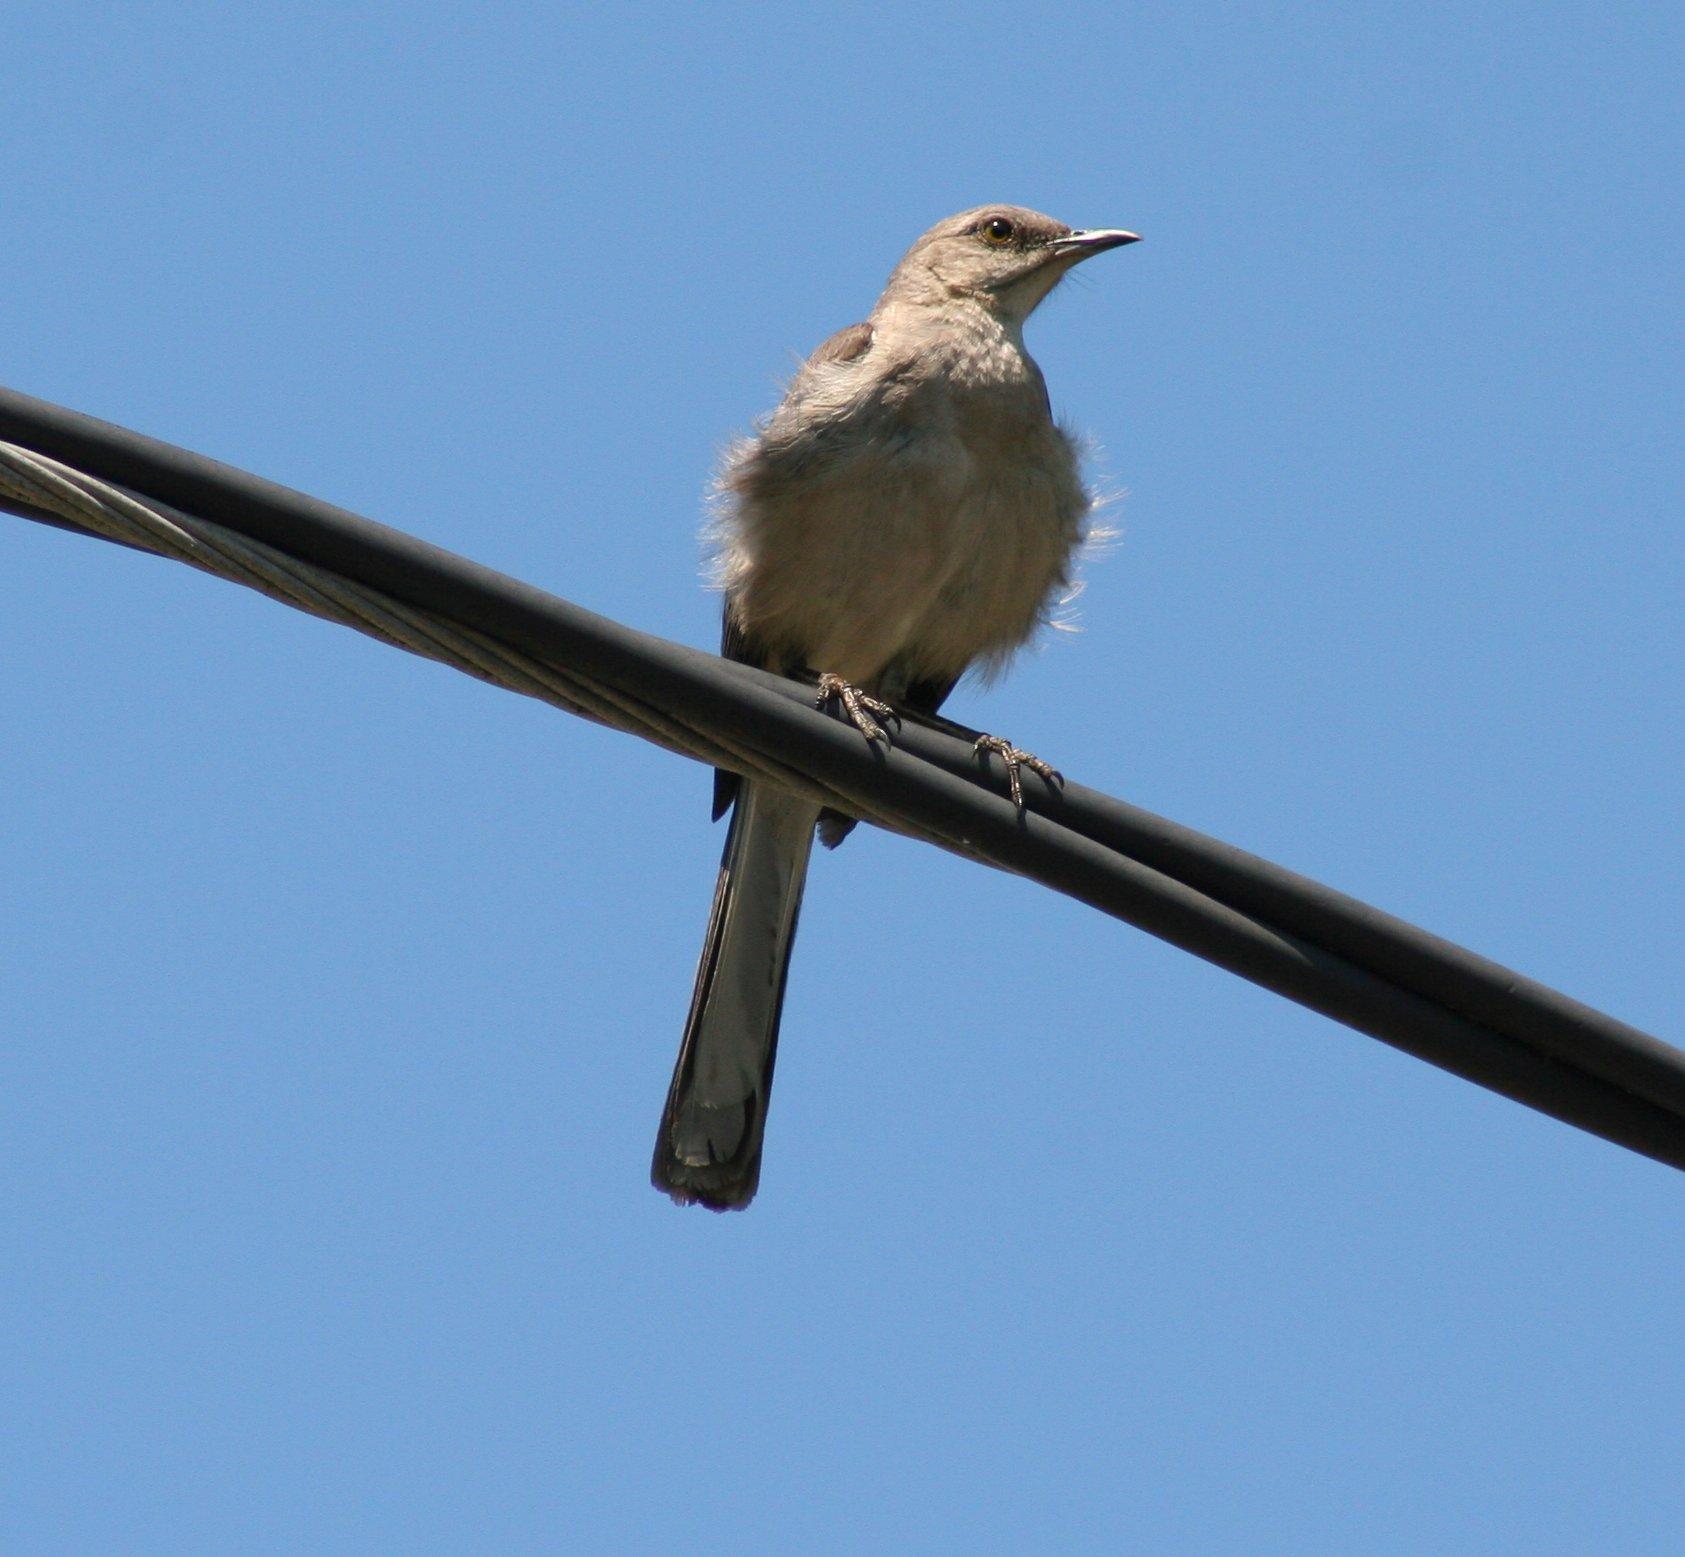 Filebird On A Wire 3690480985jpg Wikimedia Commons